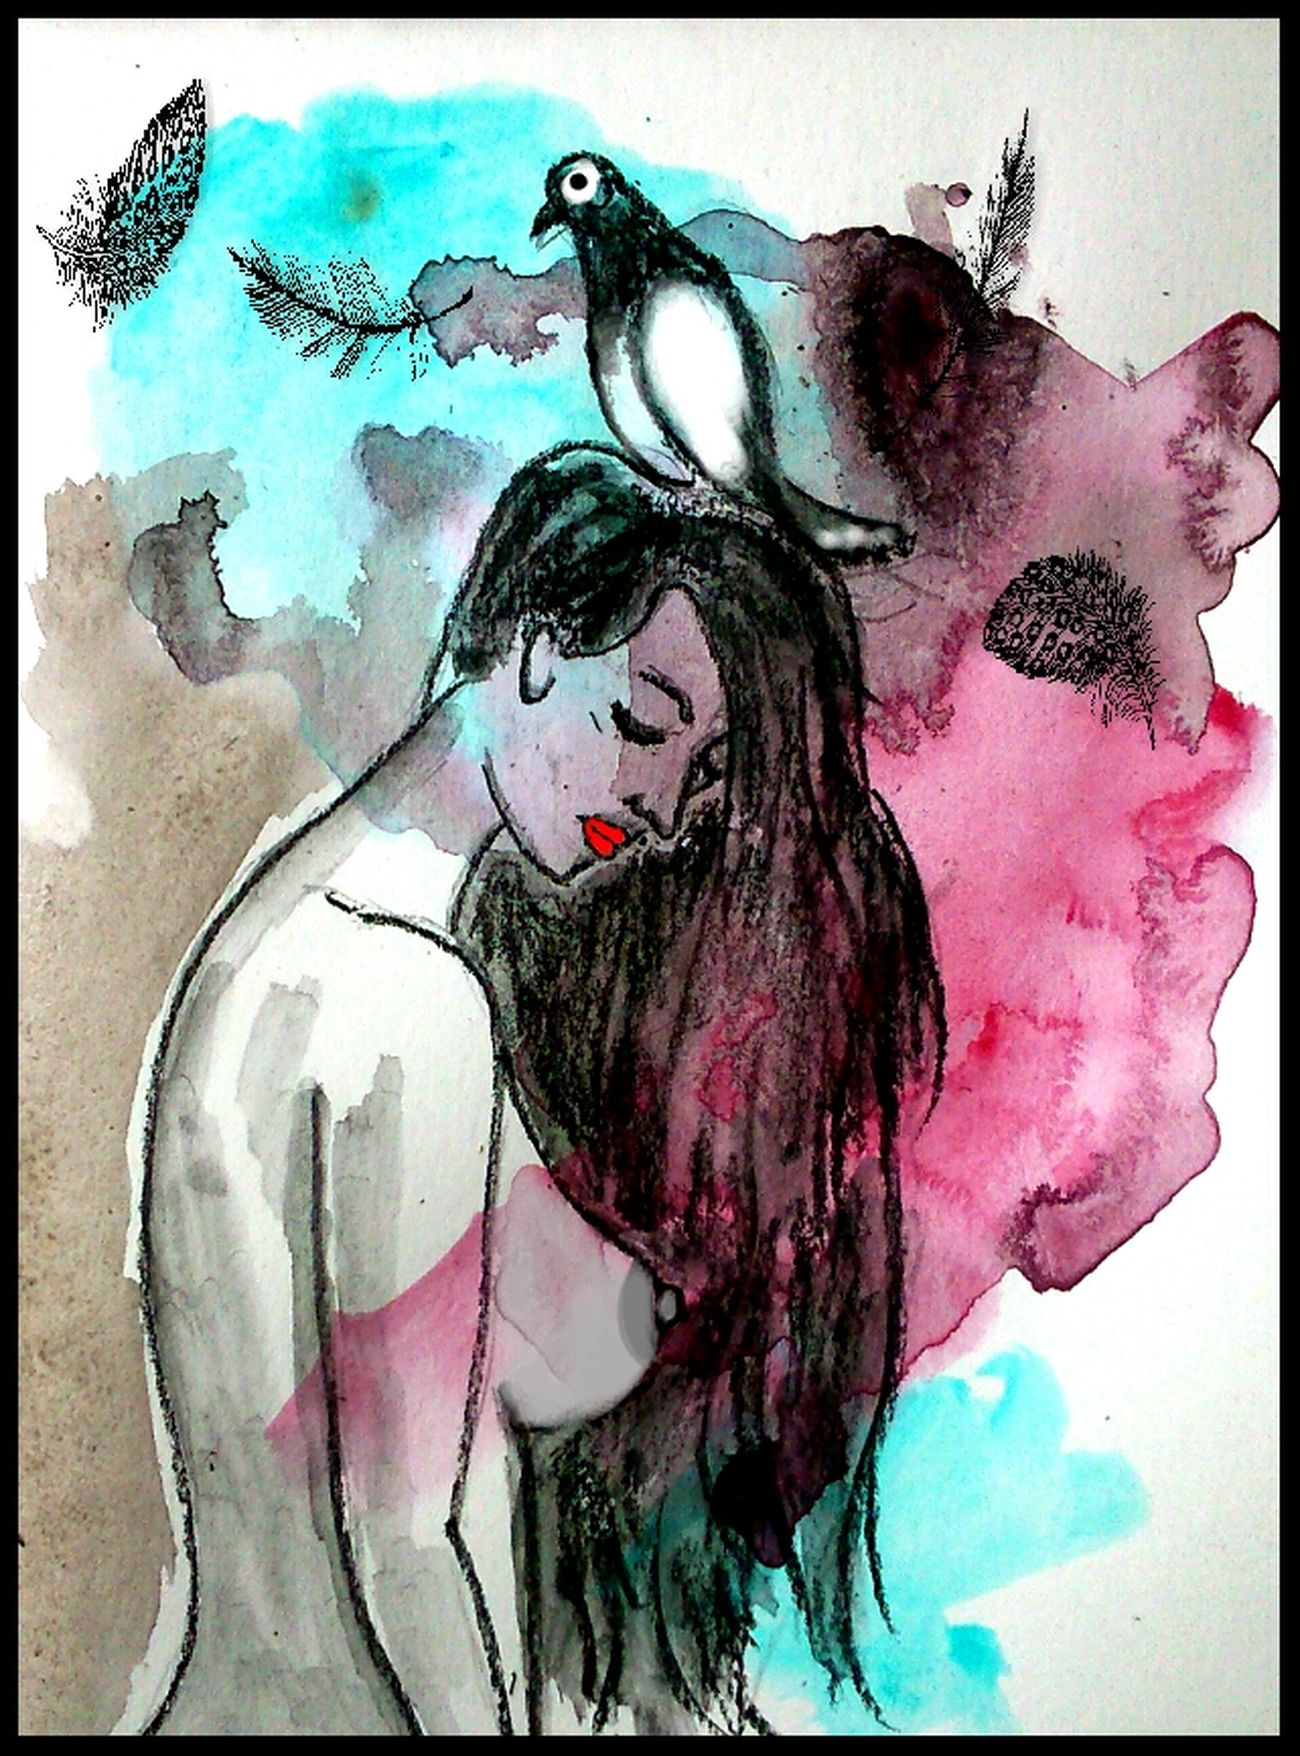 Watercolor Painting Sketch Pad Drawing - Art Product Beauty Artistic Human Representation Myartwork Sketch Art And Craft